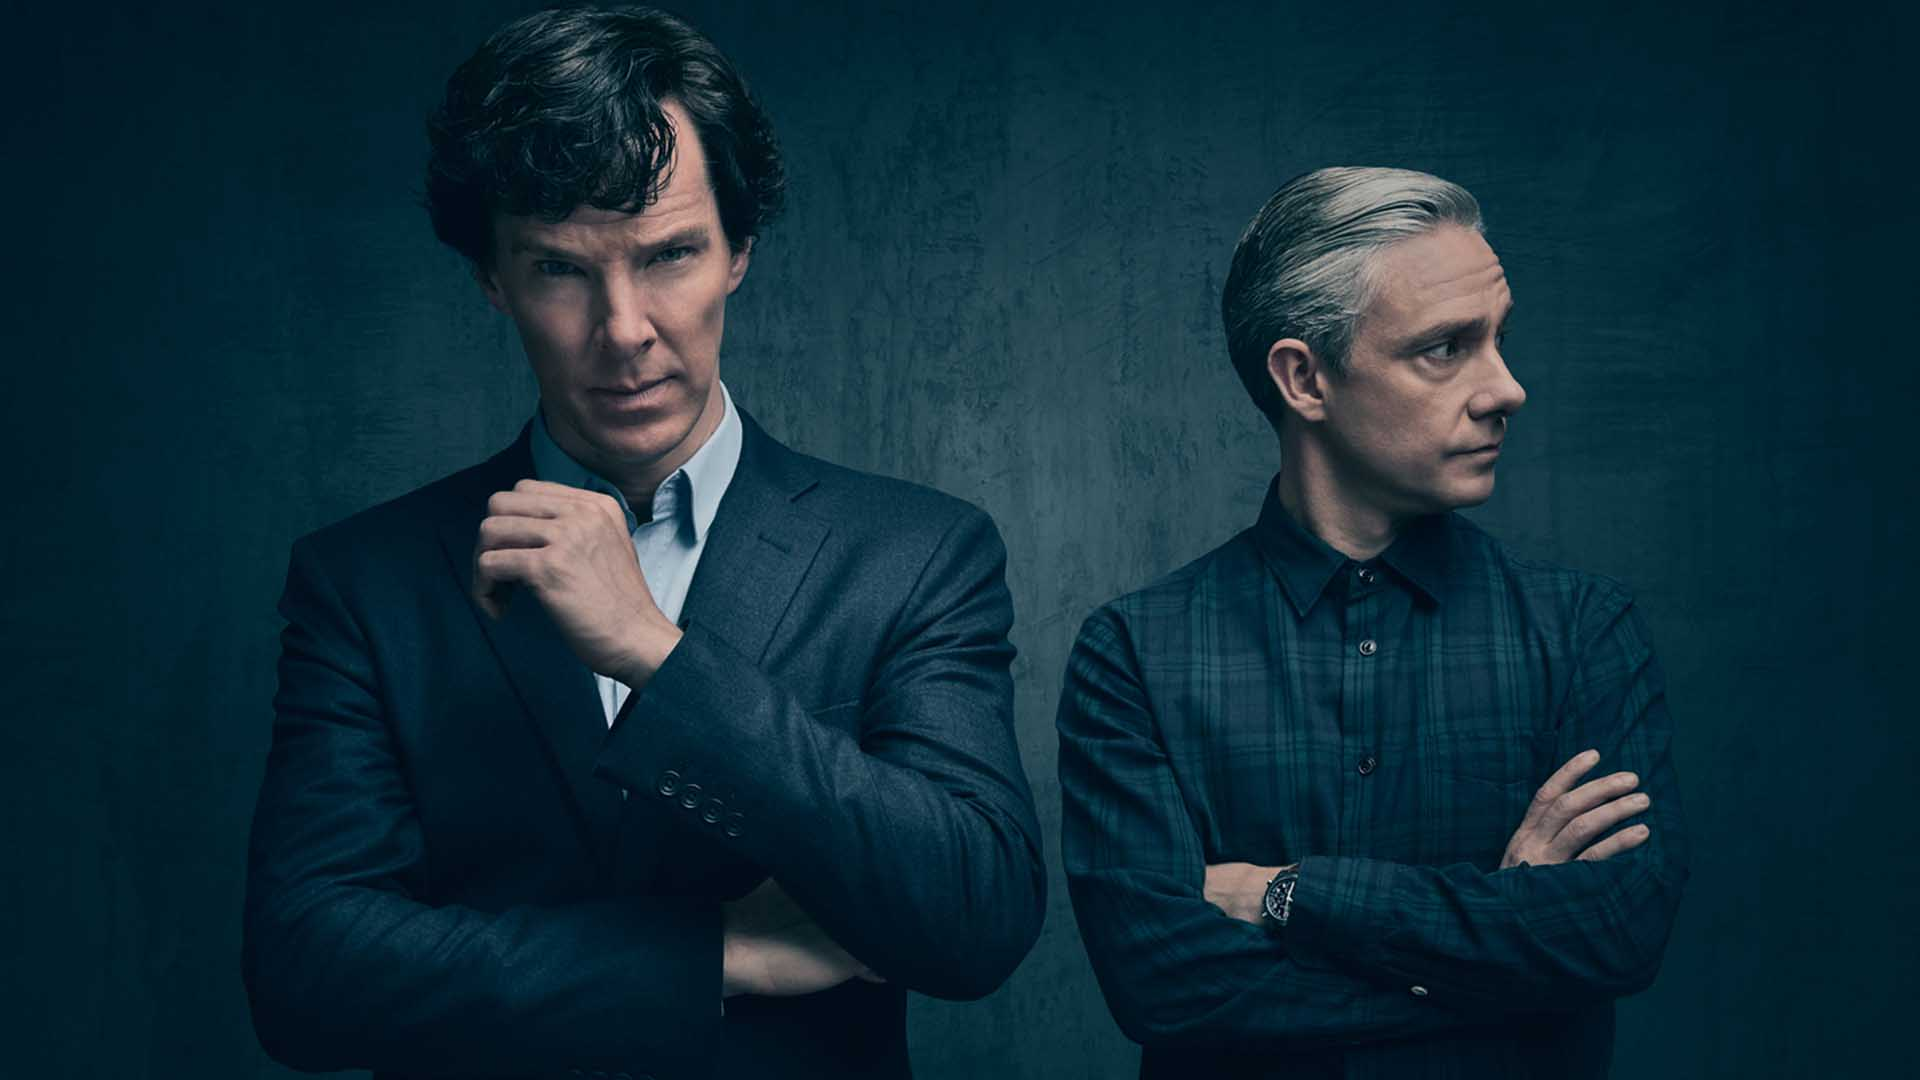 Hazugság Sherlock